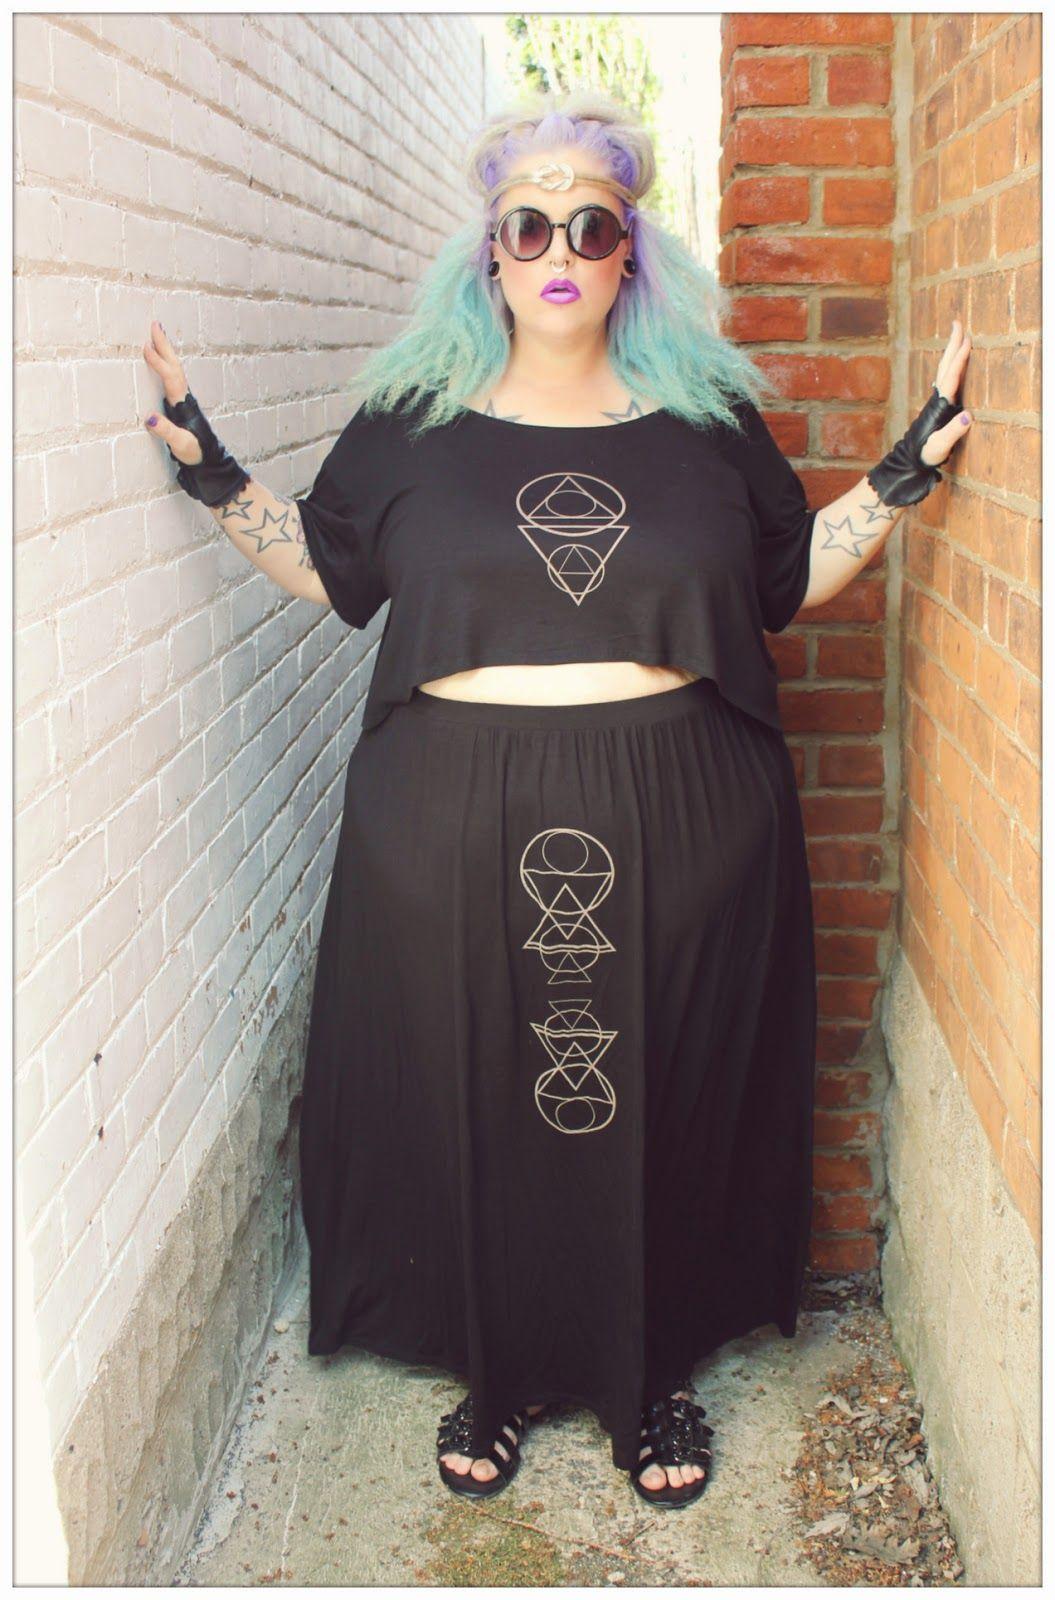 Fatshion Peepshow: Domino Dollhouse Crop Top Goddess